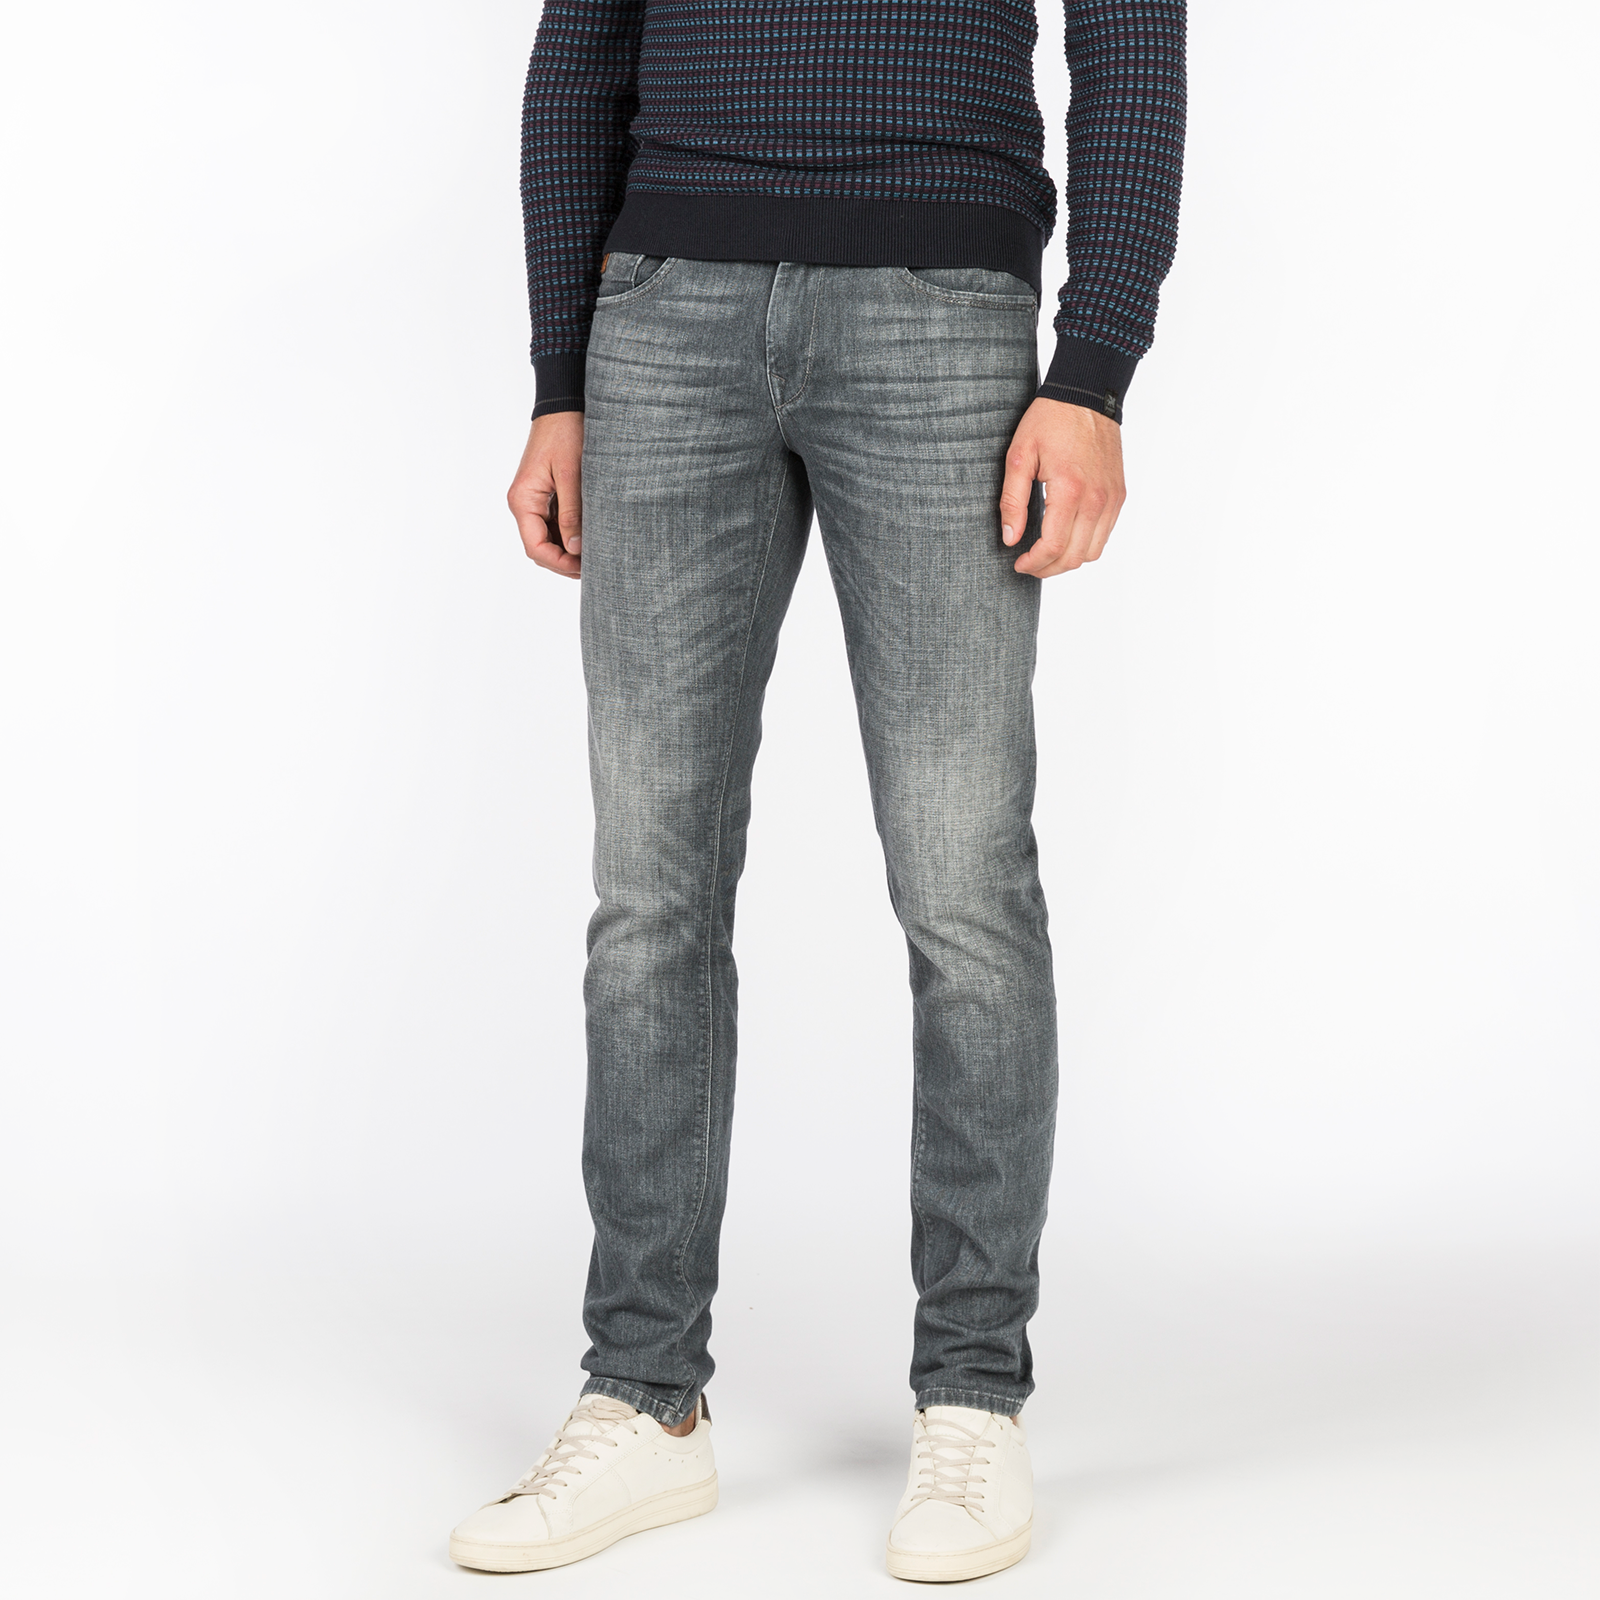 Vanguard jeans, V7 Rider,  grijs, VTR515-NSL